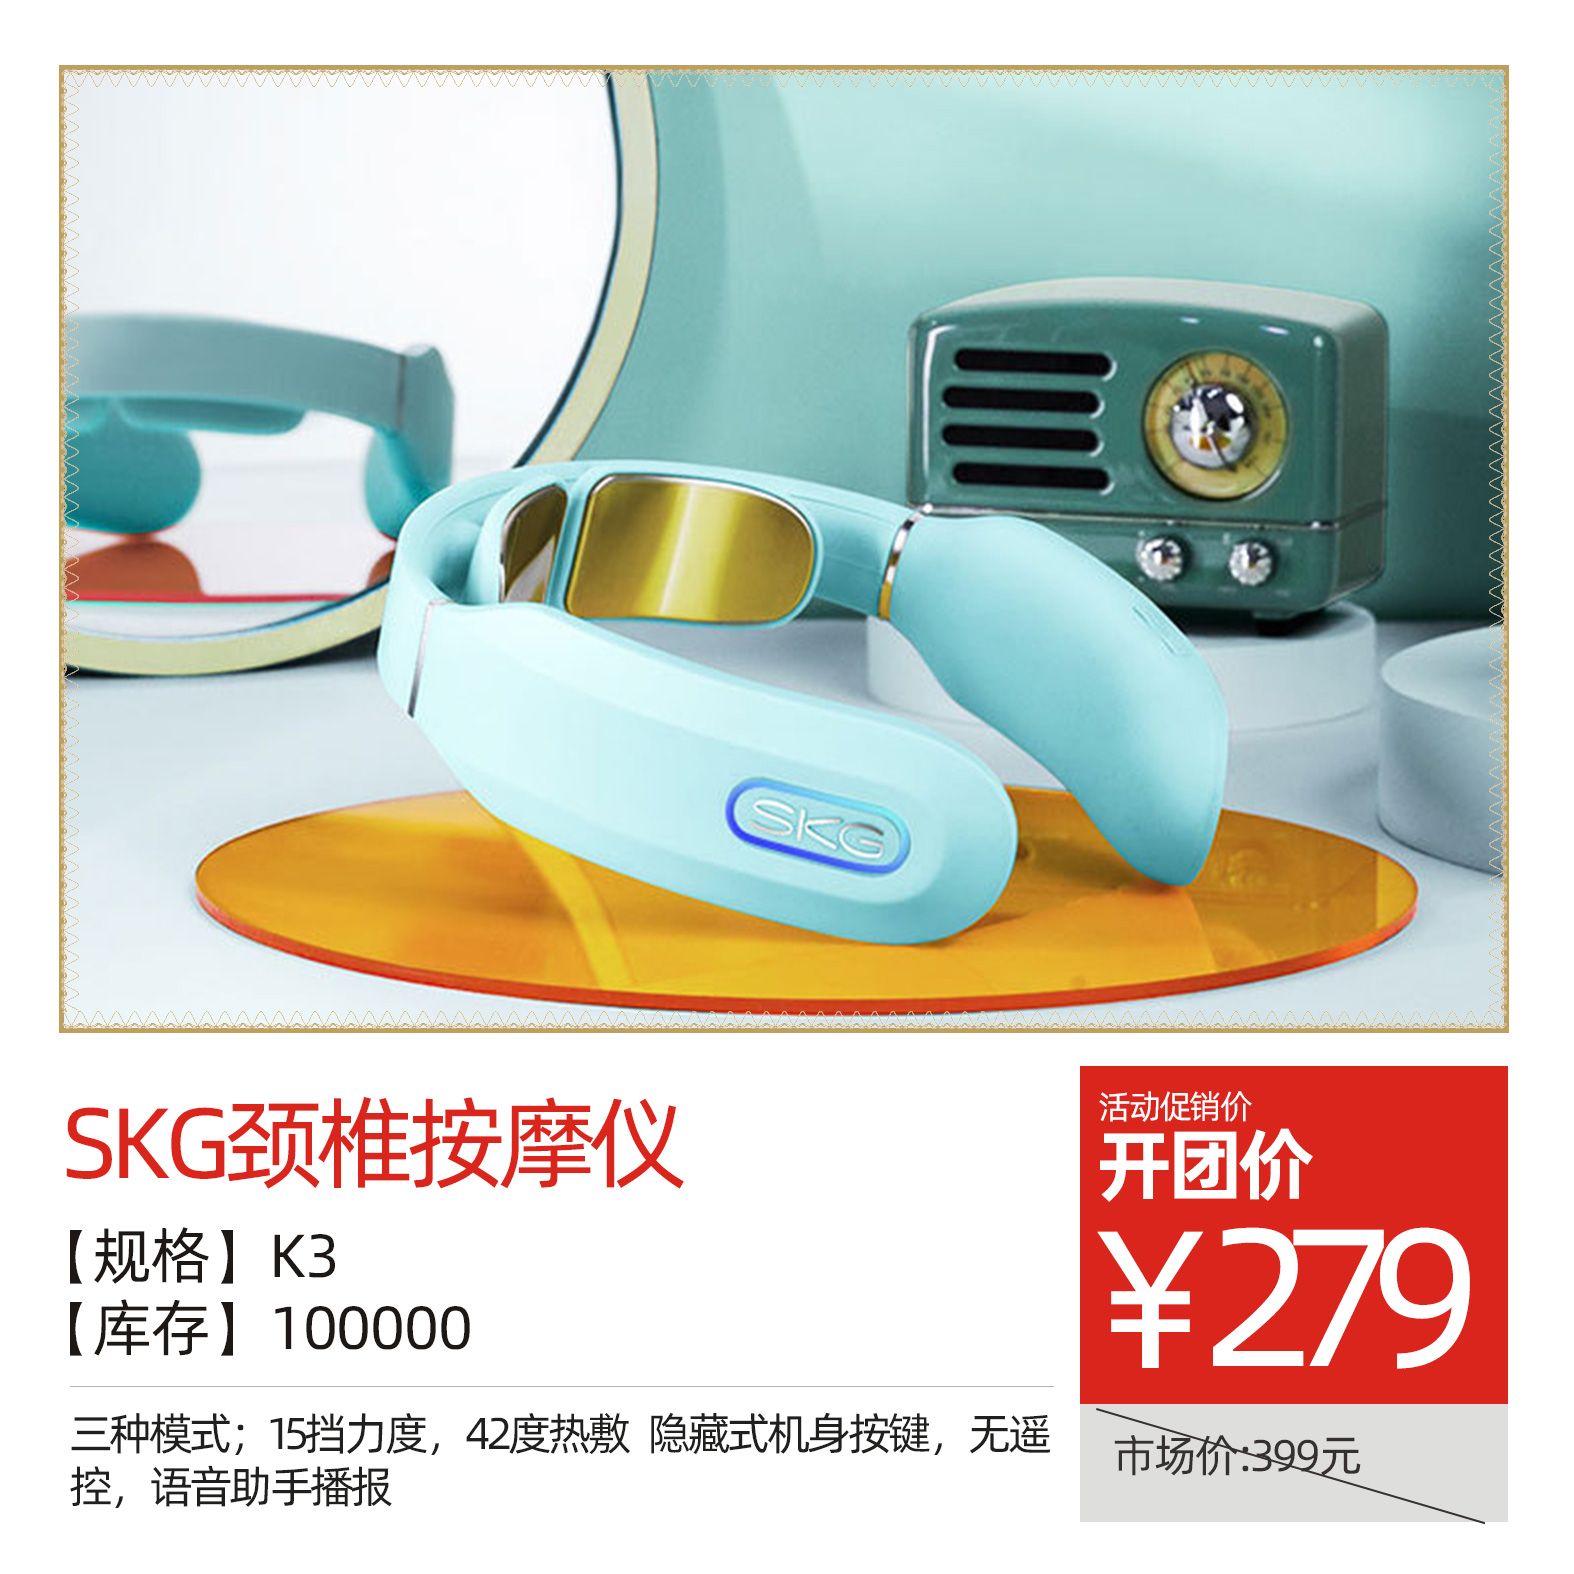 SKG颈椎按摩仪 【规格】:K3